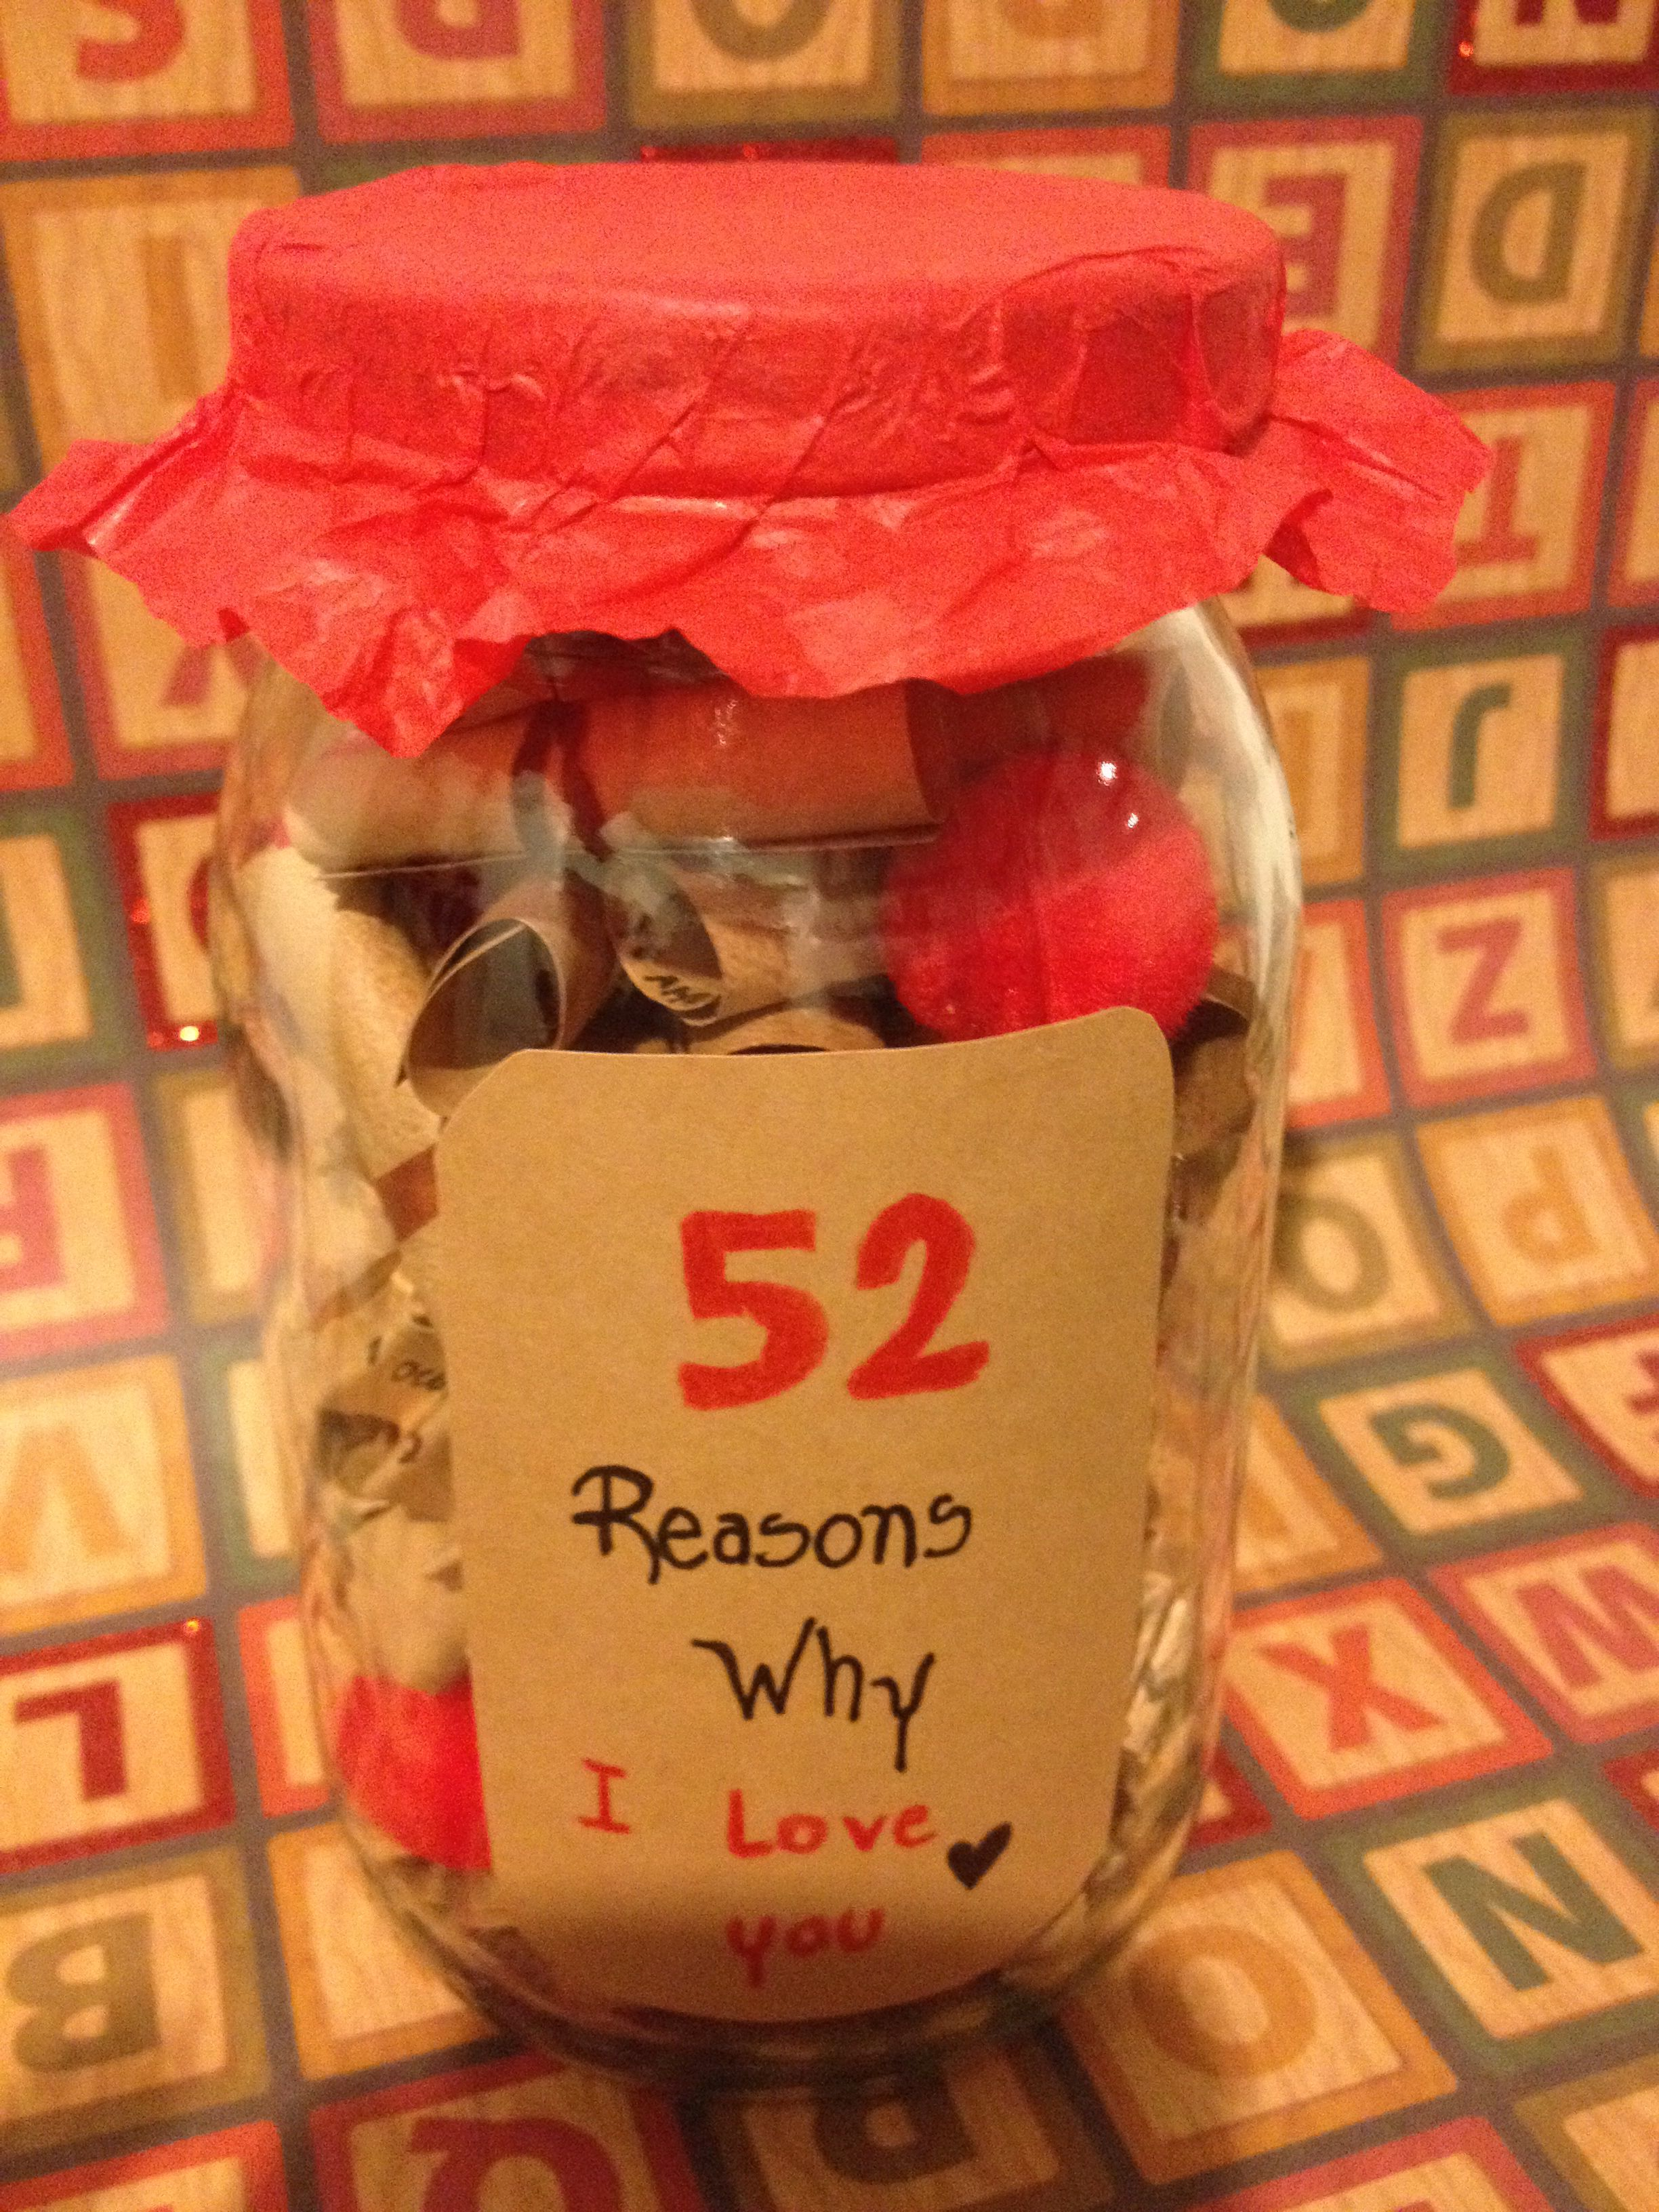 Boyfriend sanvalentin regalo detalle love birthday cards love birthday cards love gifts - Ideas para sanvalentin ...